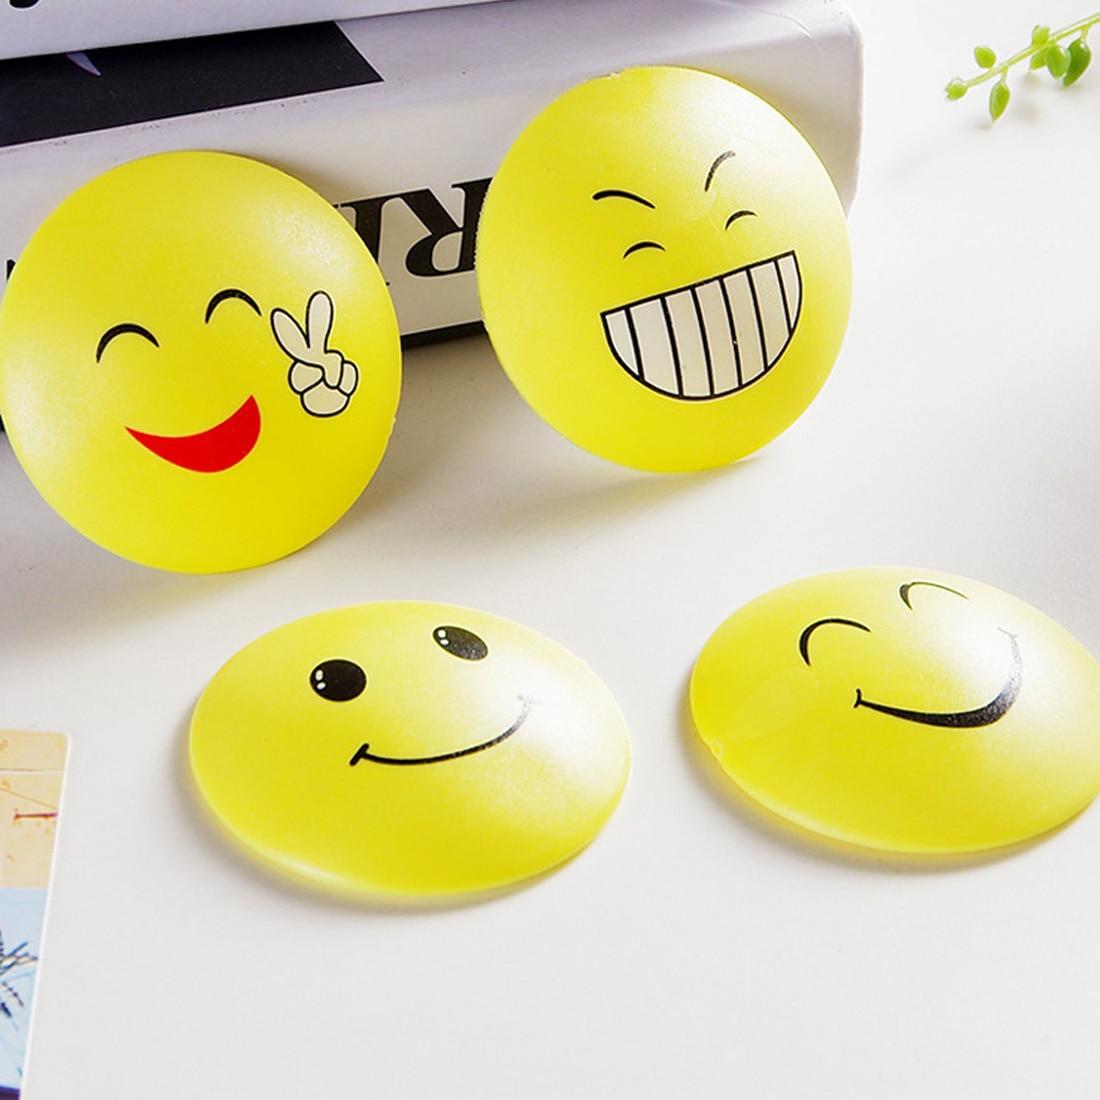 New 3D Wall Stickers Rubber Door Handle Knob Emoji Crash Pad Wall Protector Self Adhesive Bumper StickersNew 3D Wall Stickers Rubber Door Handle Knob Emoji Crash Pad Wall Protector Self Adhesive Bumper Stickers